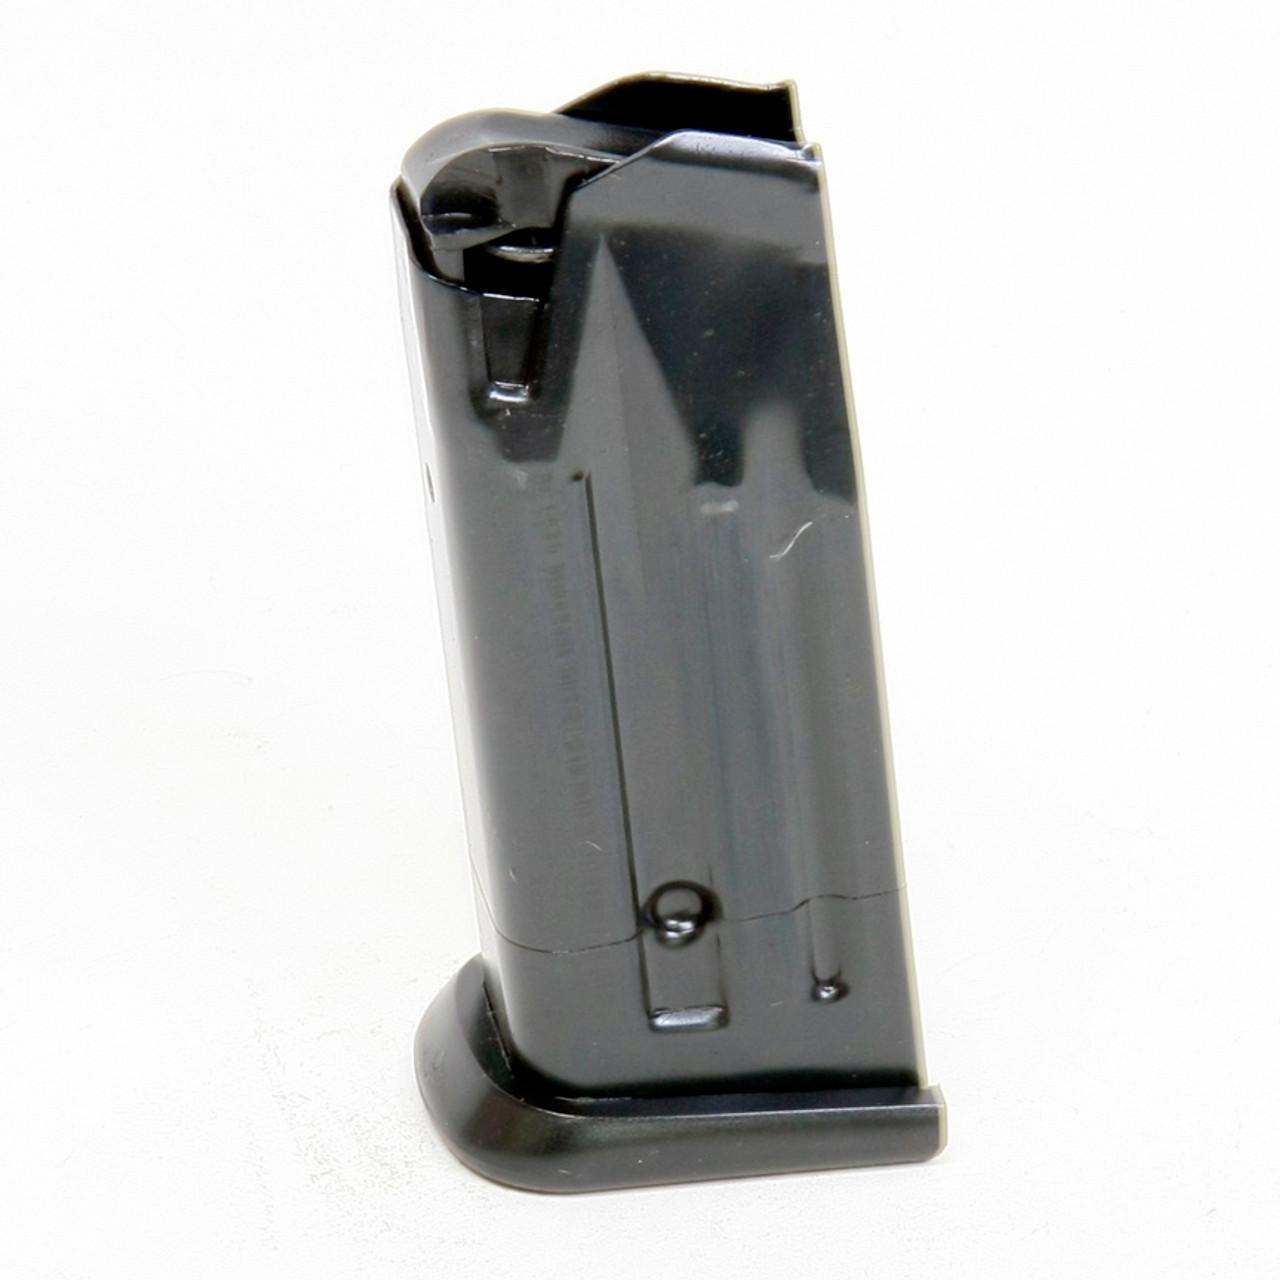 Para-Ordnance® P10 .40 S&W (10) Rd - Blue Steel